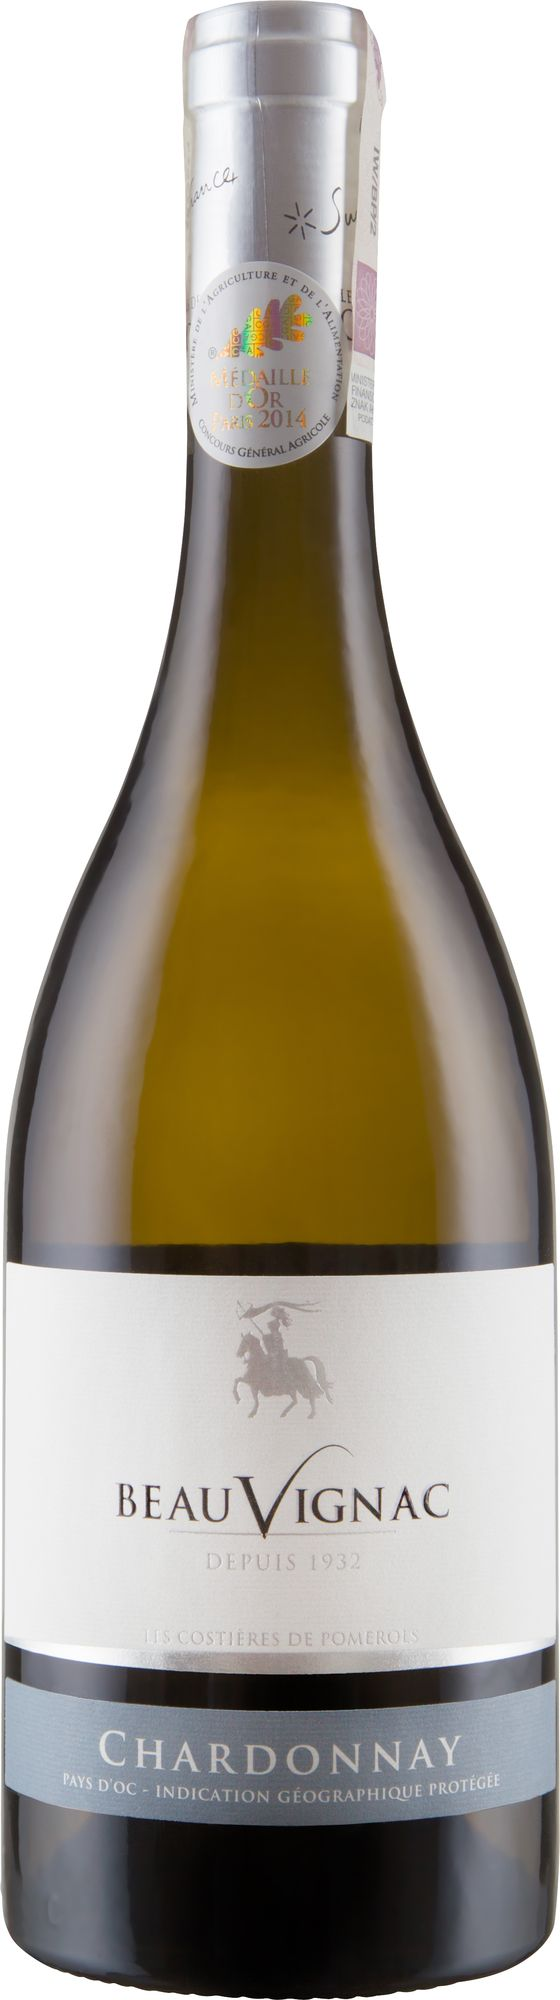 Wino Costieres Pomerols Beauvignac Chardonnay Pays d'Oc IGP